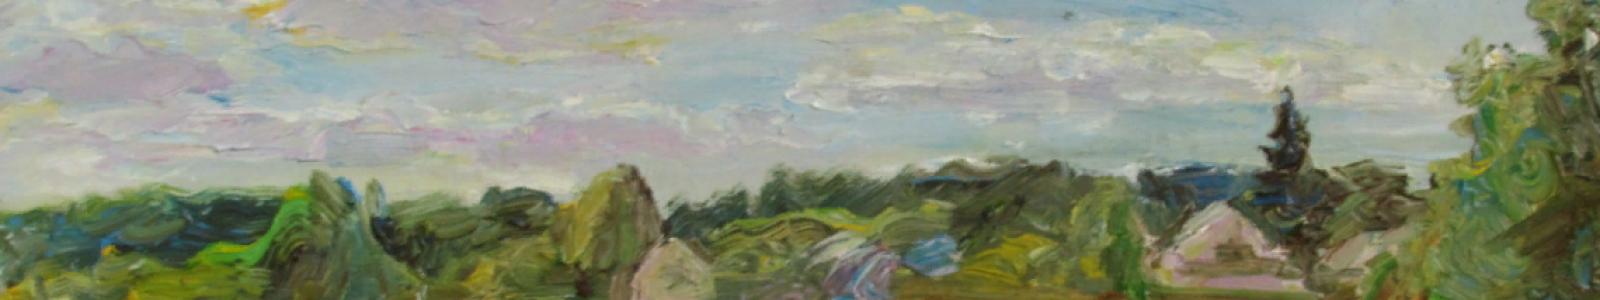 Gallery Painter Marina Novikova